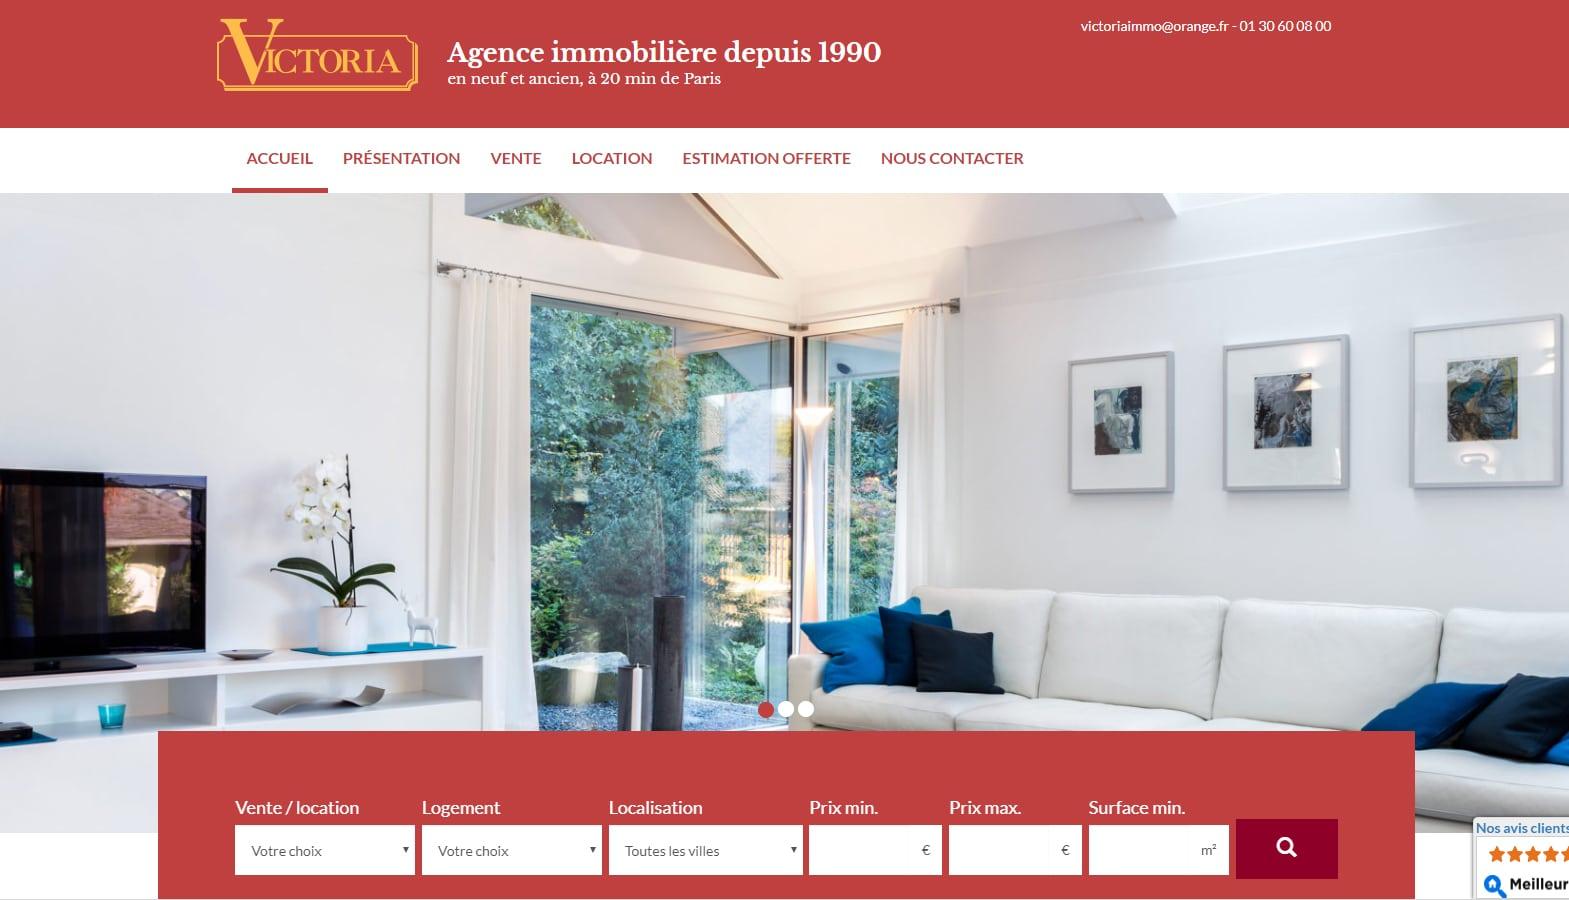 bois d 39 arcy annonces immobili res immobilier victoria. Black Bedroom Furniture Sets. Home Design Ideas